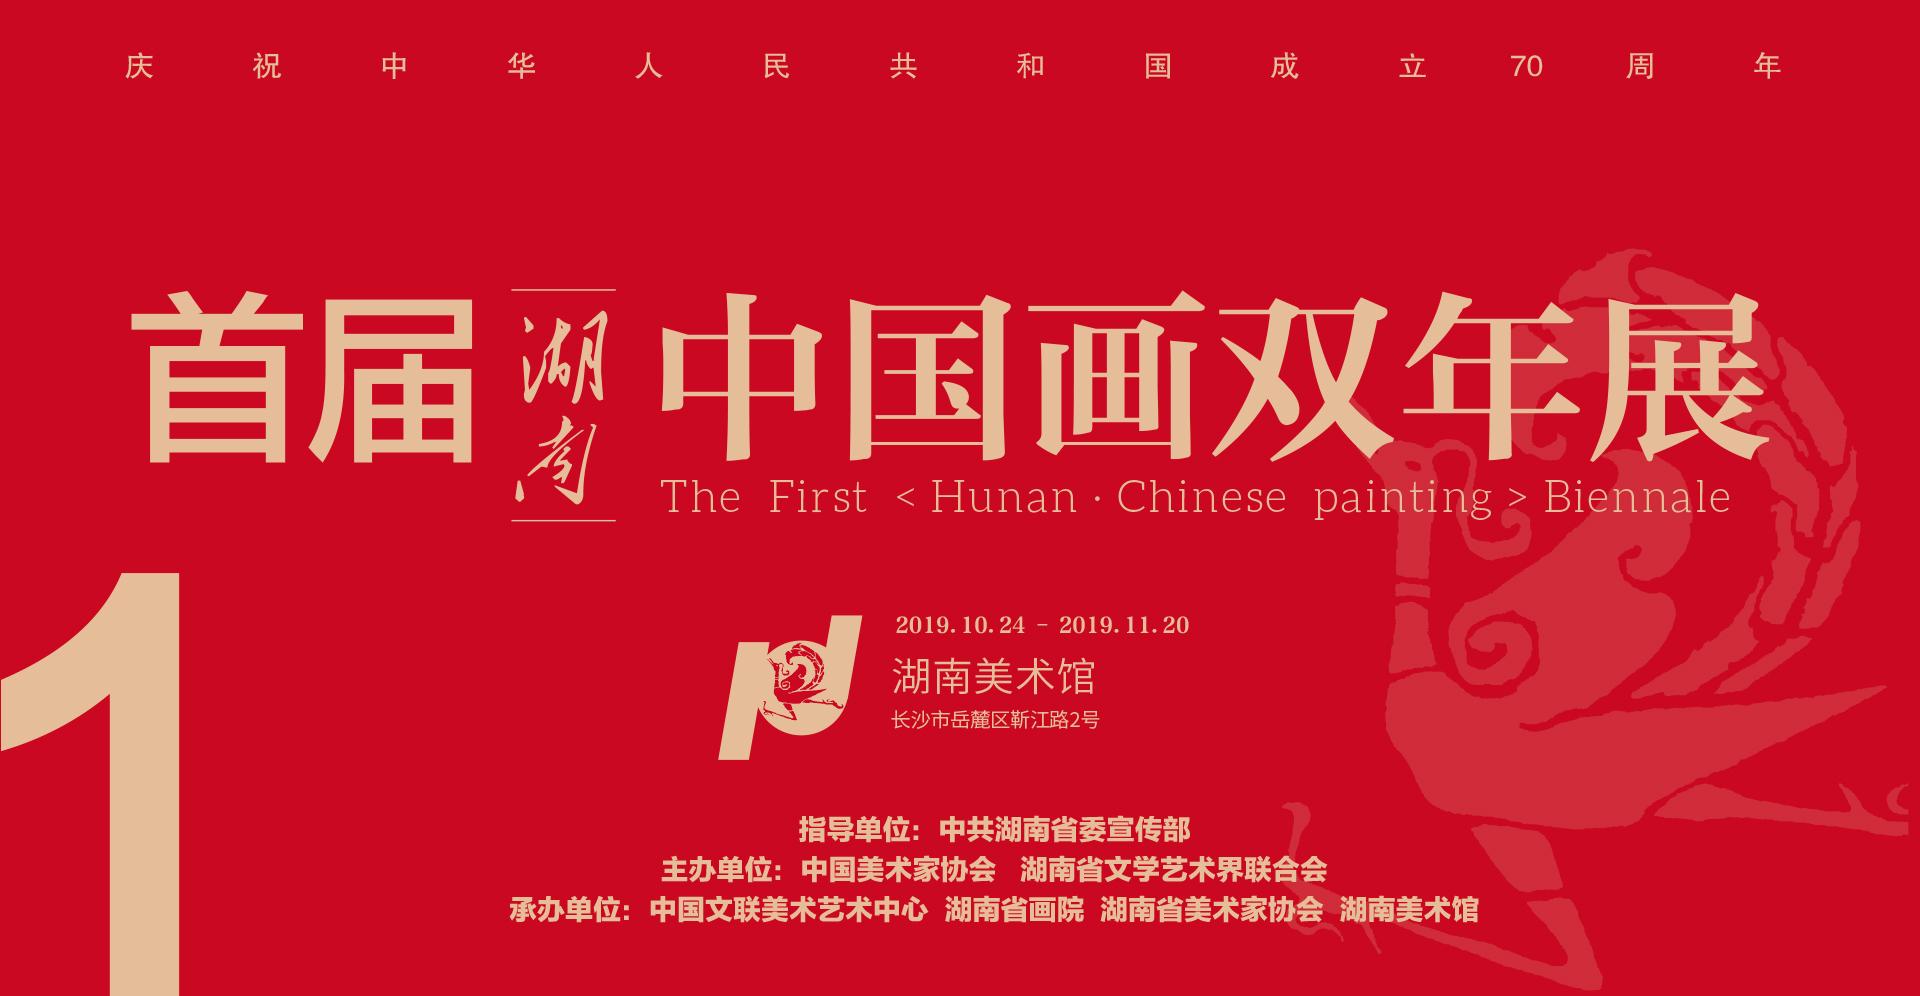 http://www.mfrv.net/hunanfangchan/70867.html